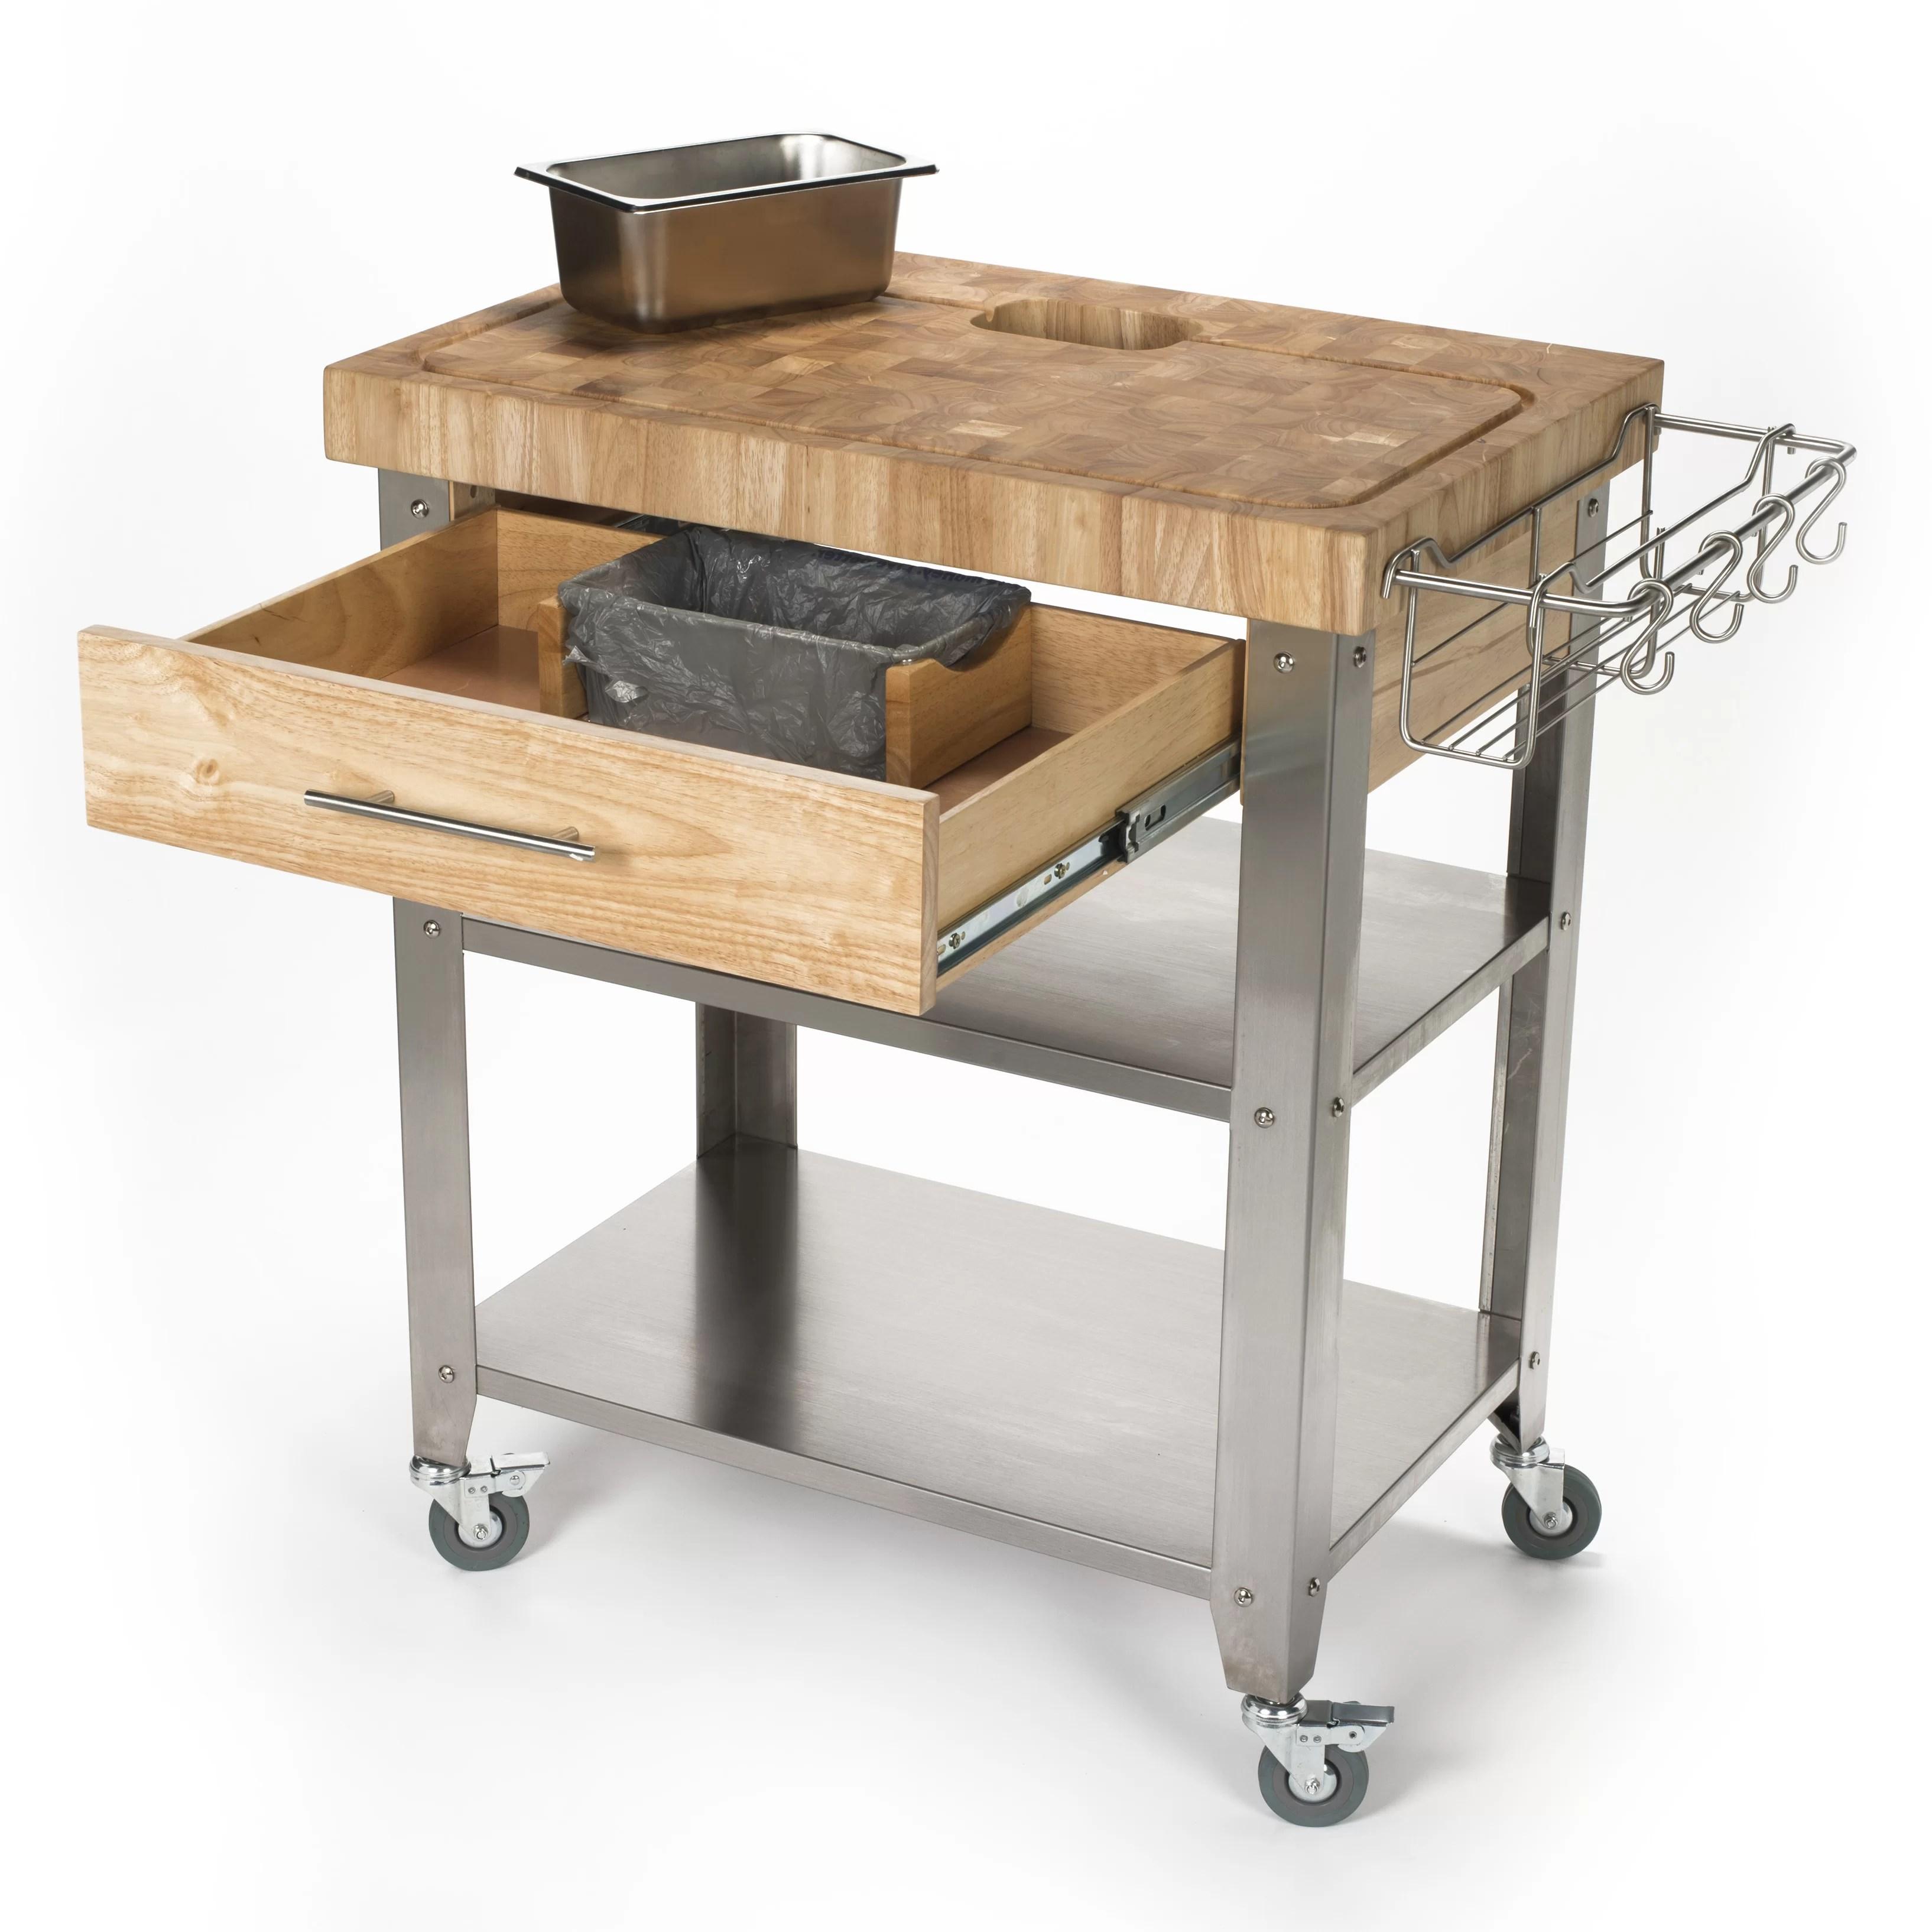 chris and kitchen cart portable island ikea pro stadium with butcher block